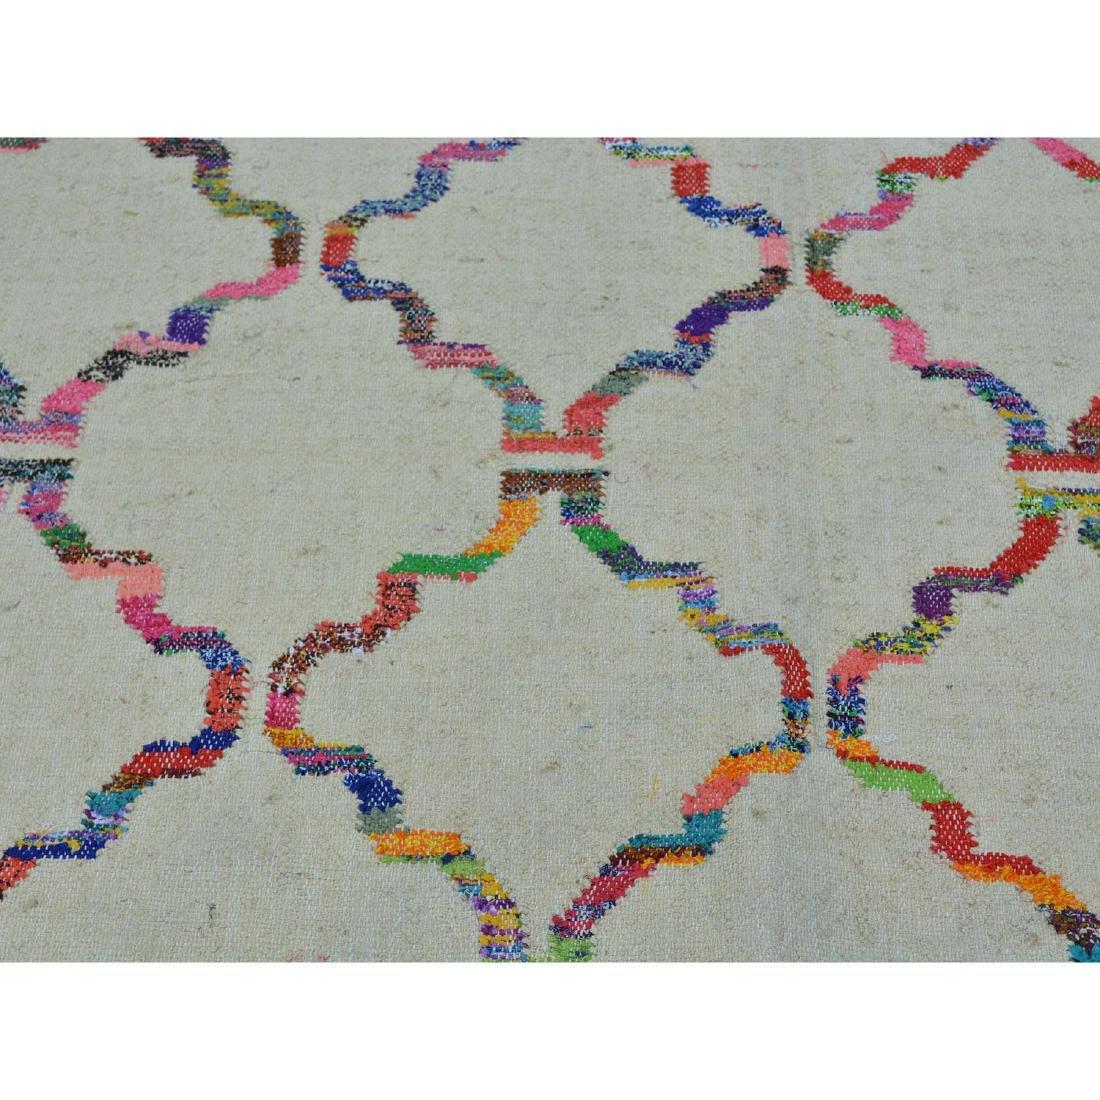 Durie Kilim Wool & Sari Silk Hand Woven Rug 5.2x7.1 - 4